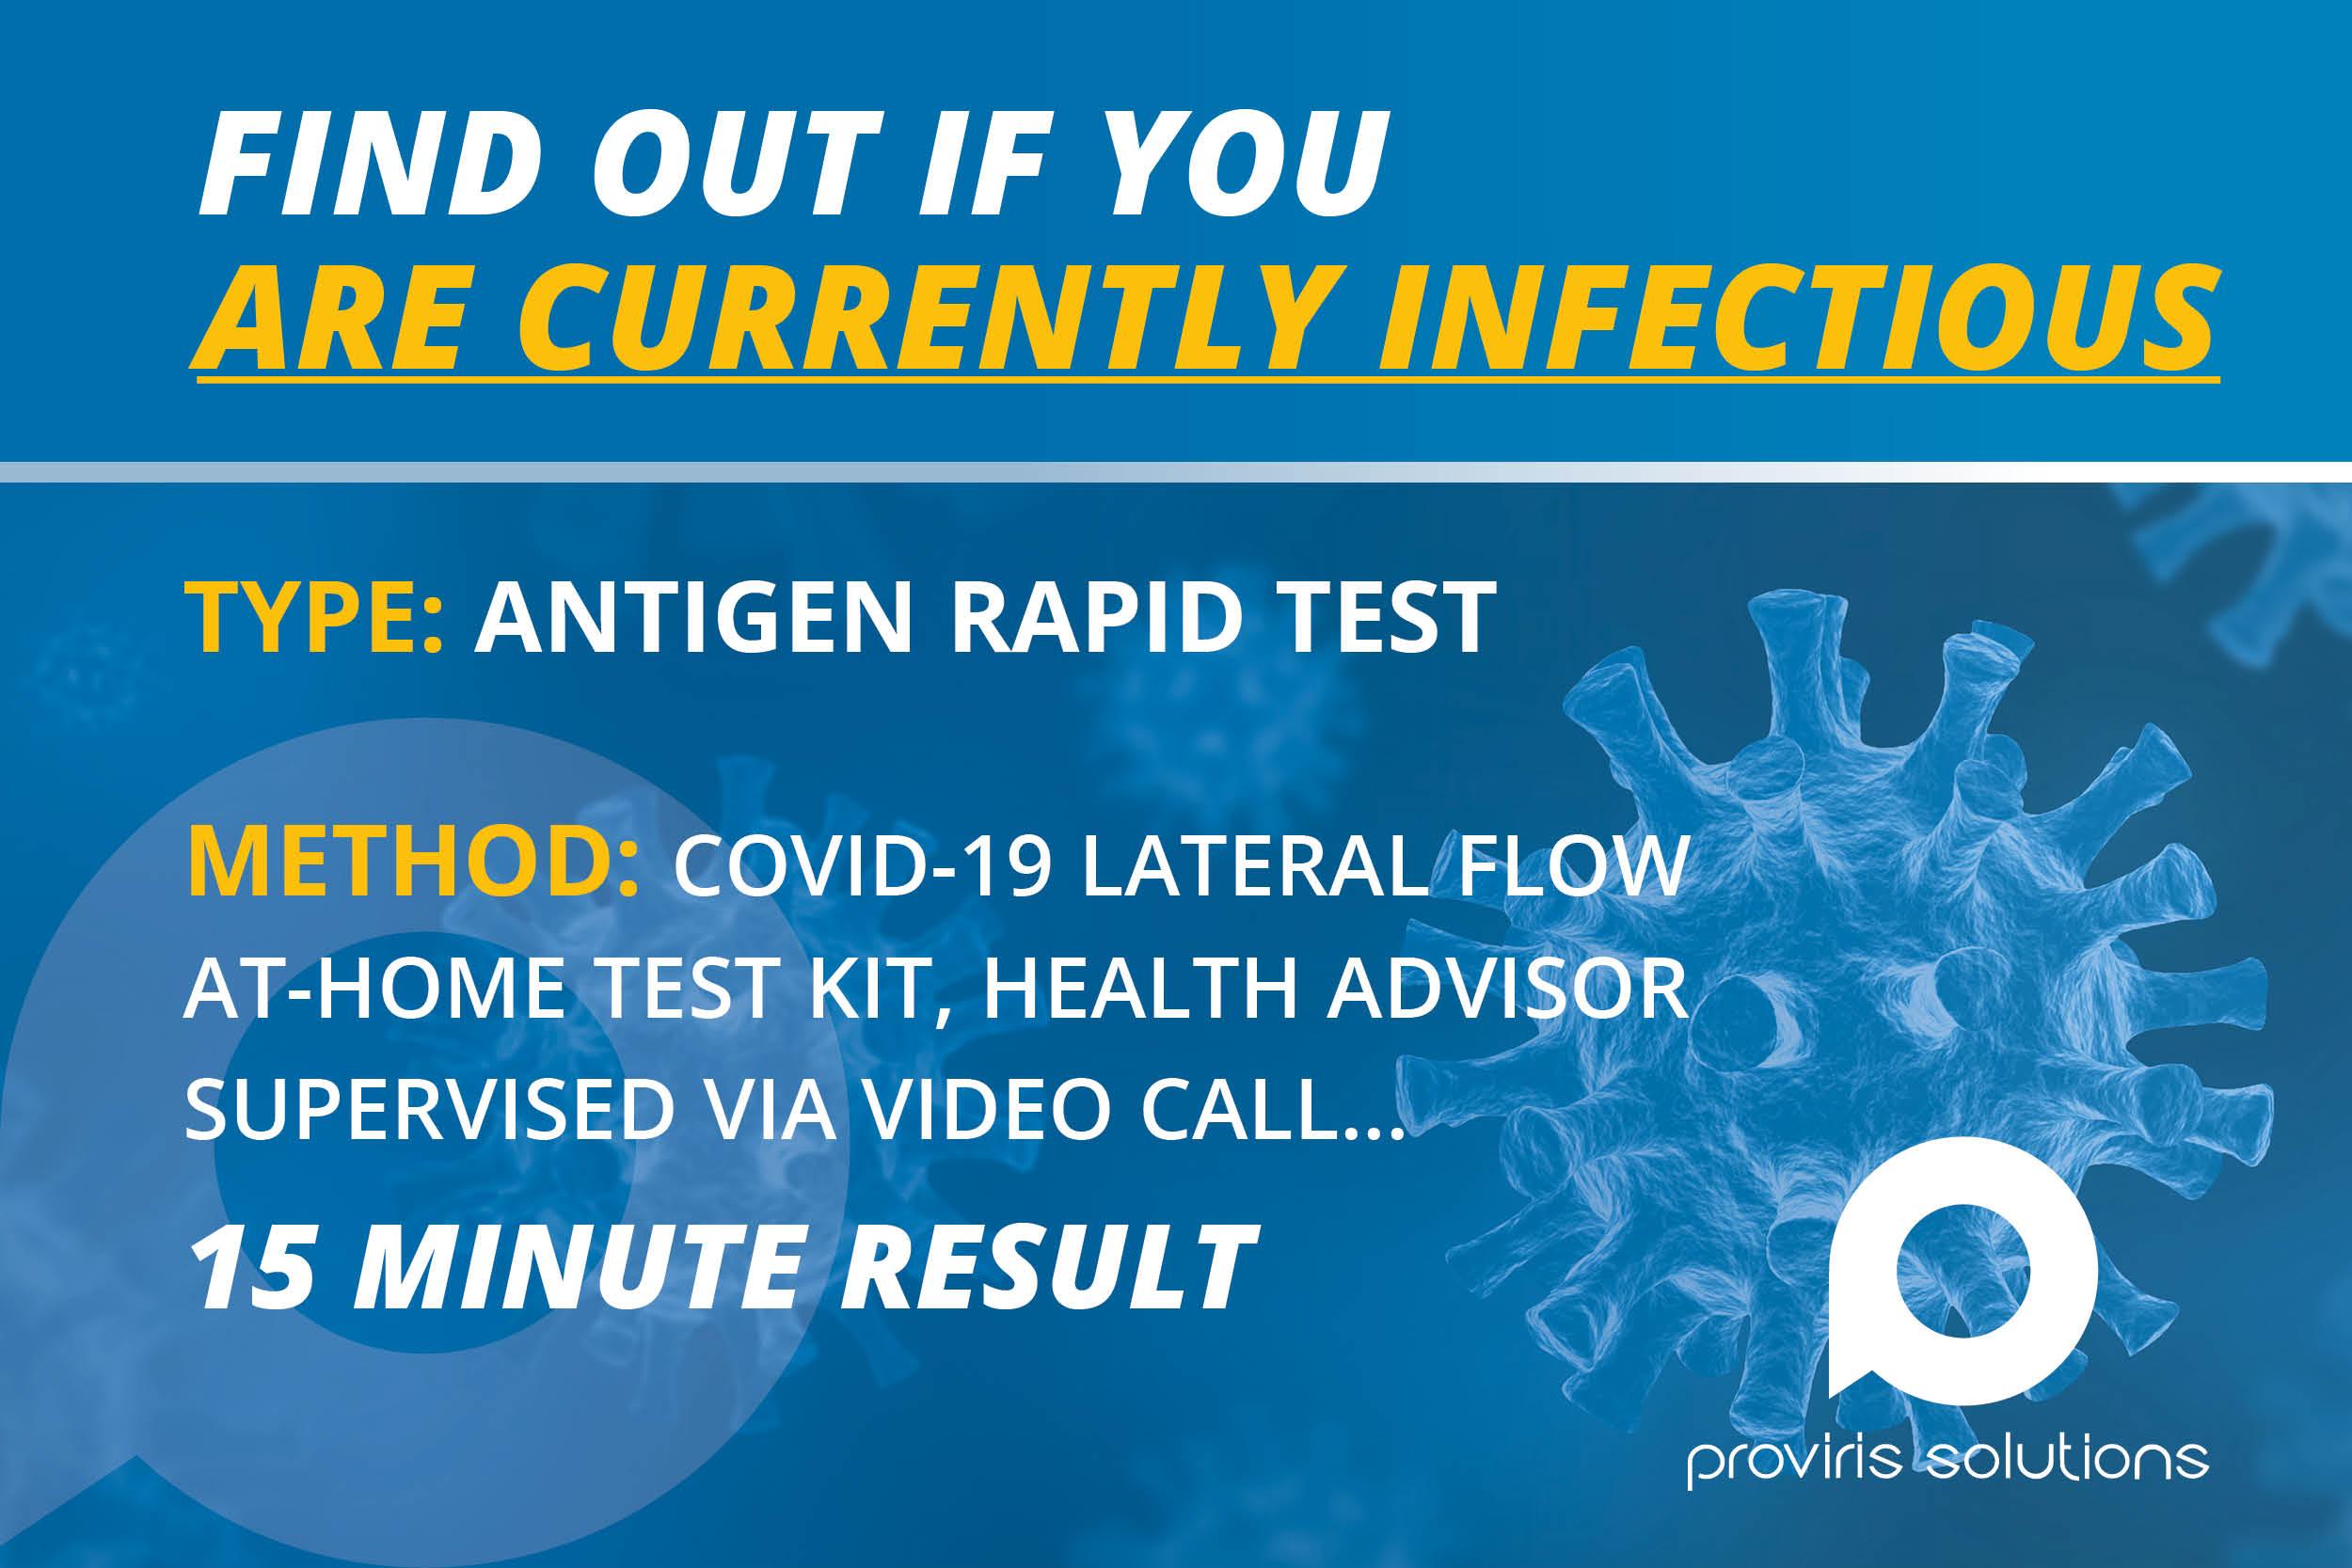 Antigen Rapid Tests